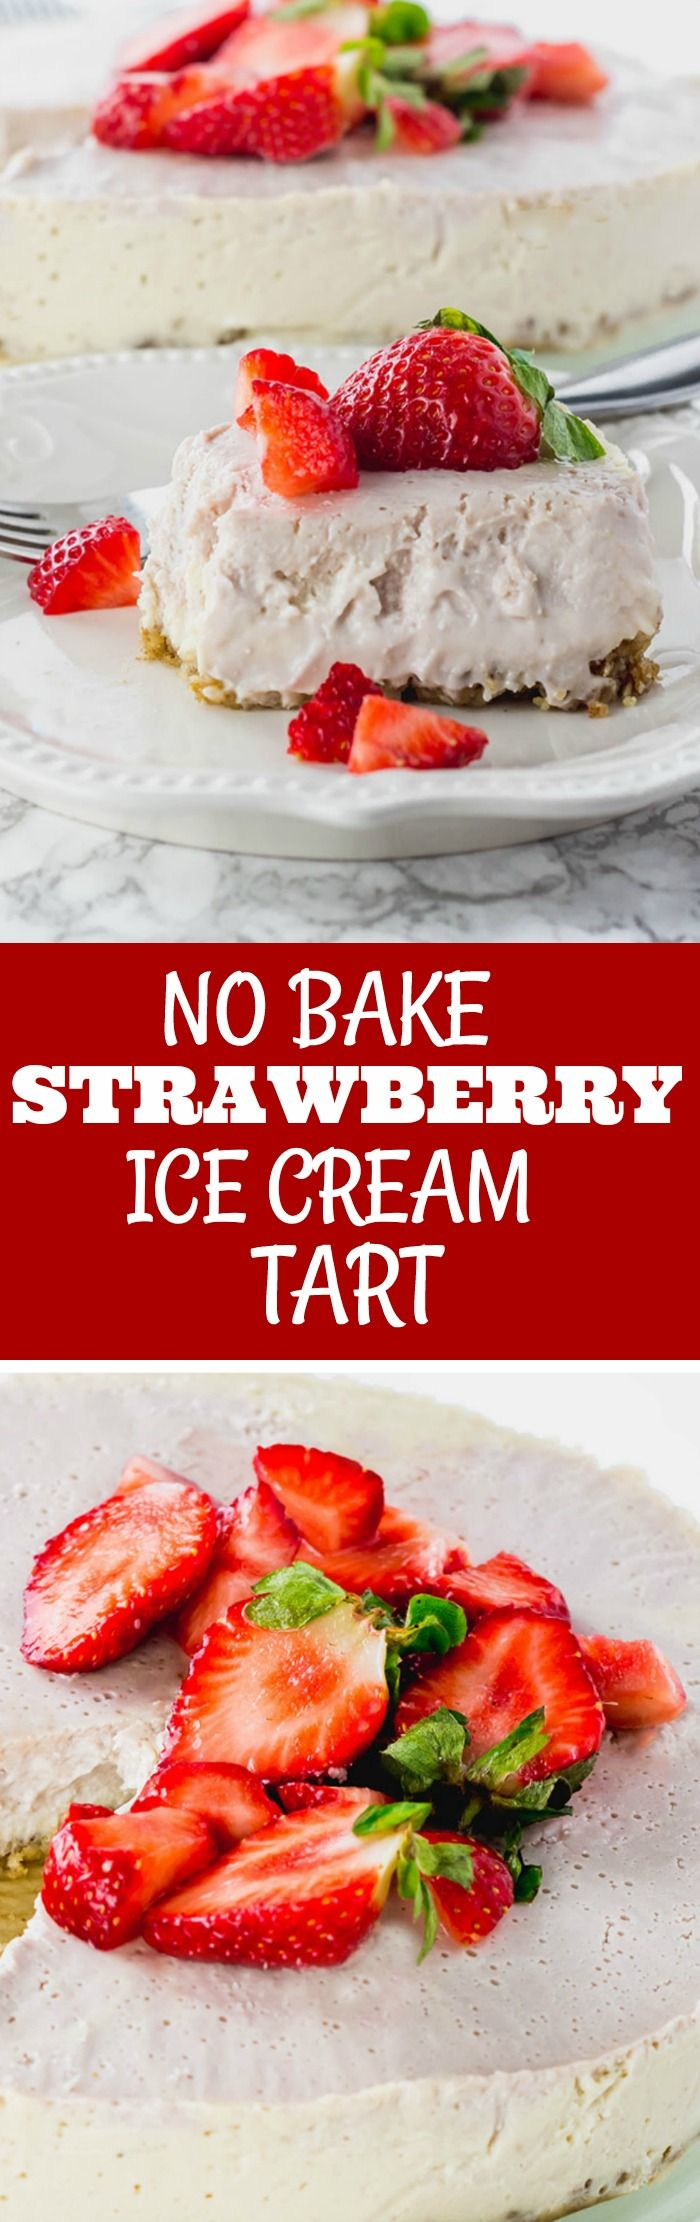 No Bake Strawberry Ice Cream Tart #veganrecipes  #glutenfreerecipes